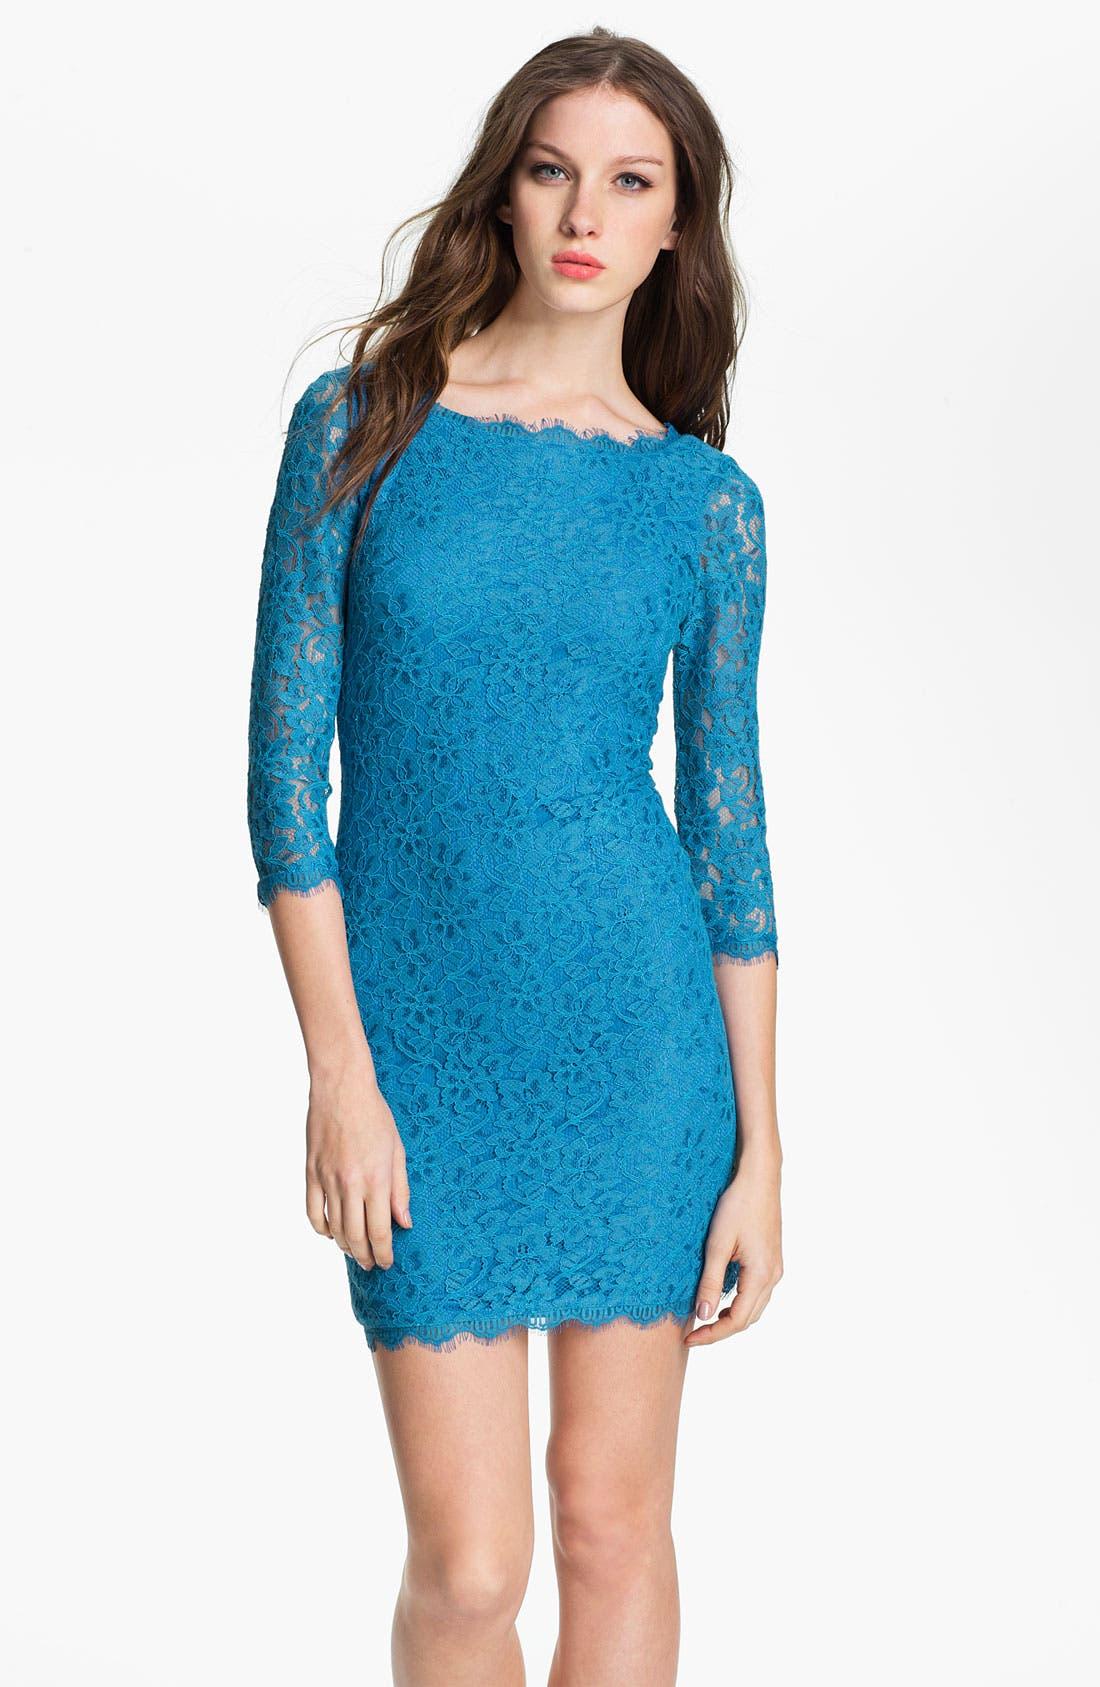 Alternate Image 1 Selected - Diane von Furstenberg 'Zarita' Lace Dress